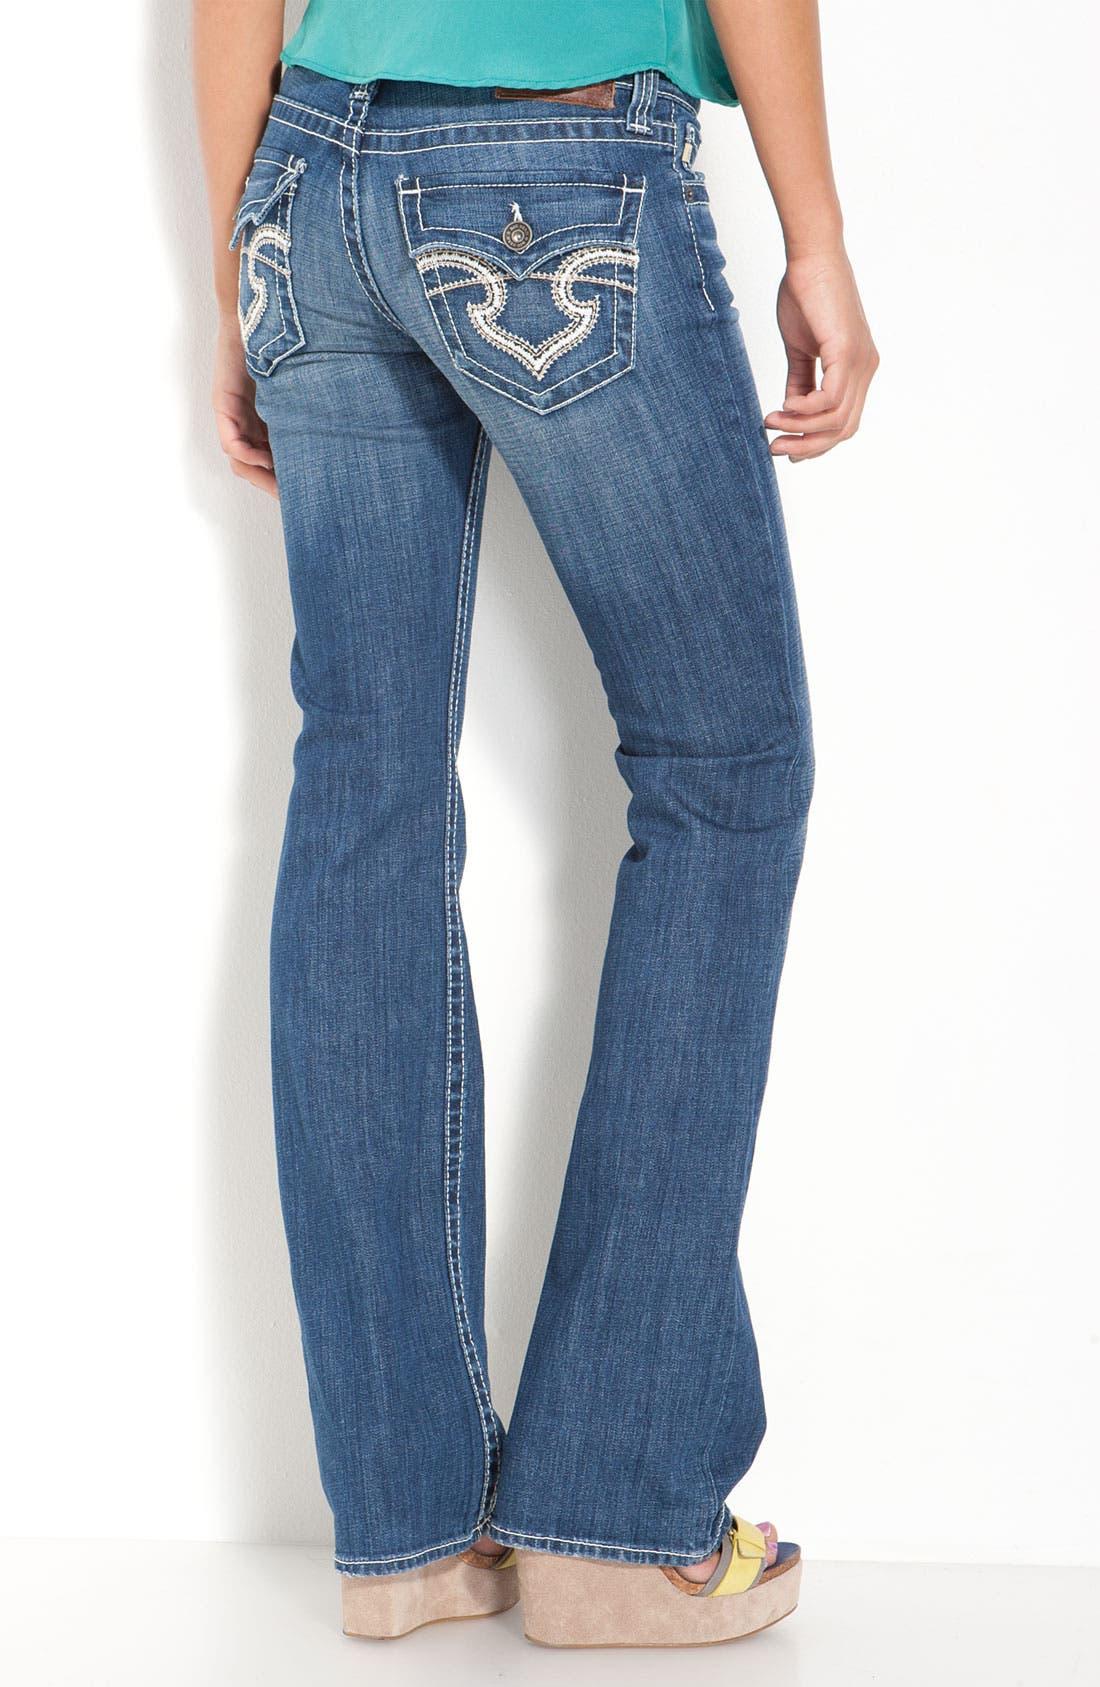 Main Image - Big Star 'Remy' Bootcut Jeans (Junction Wash) (Juniors Regular & Long)